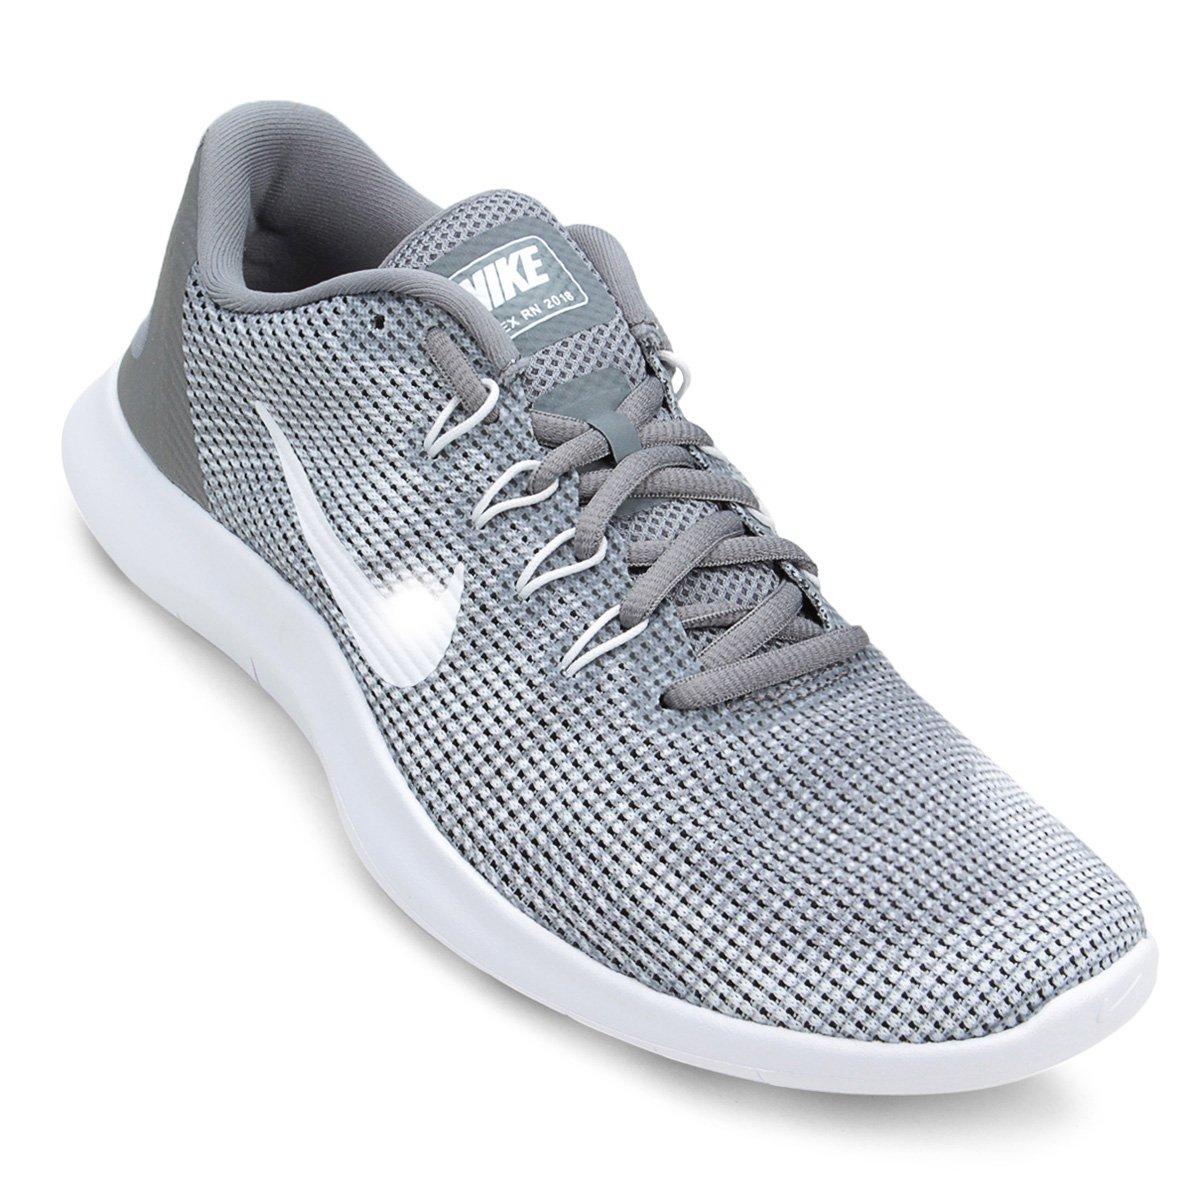 ec05f37fe8dca Tênis Nike Flex 2018 Rn Masculino - Cinza e Branco - Compre Agora ...